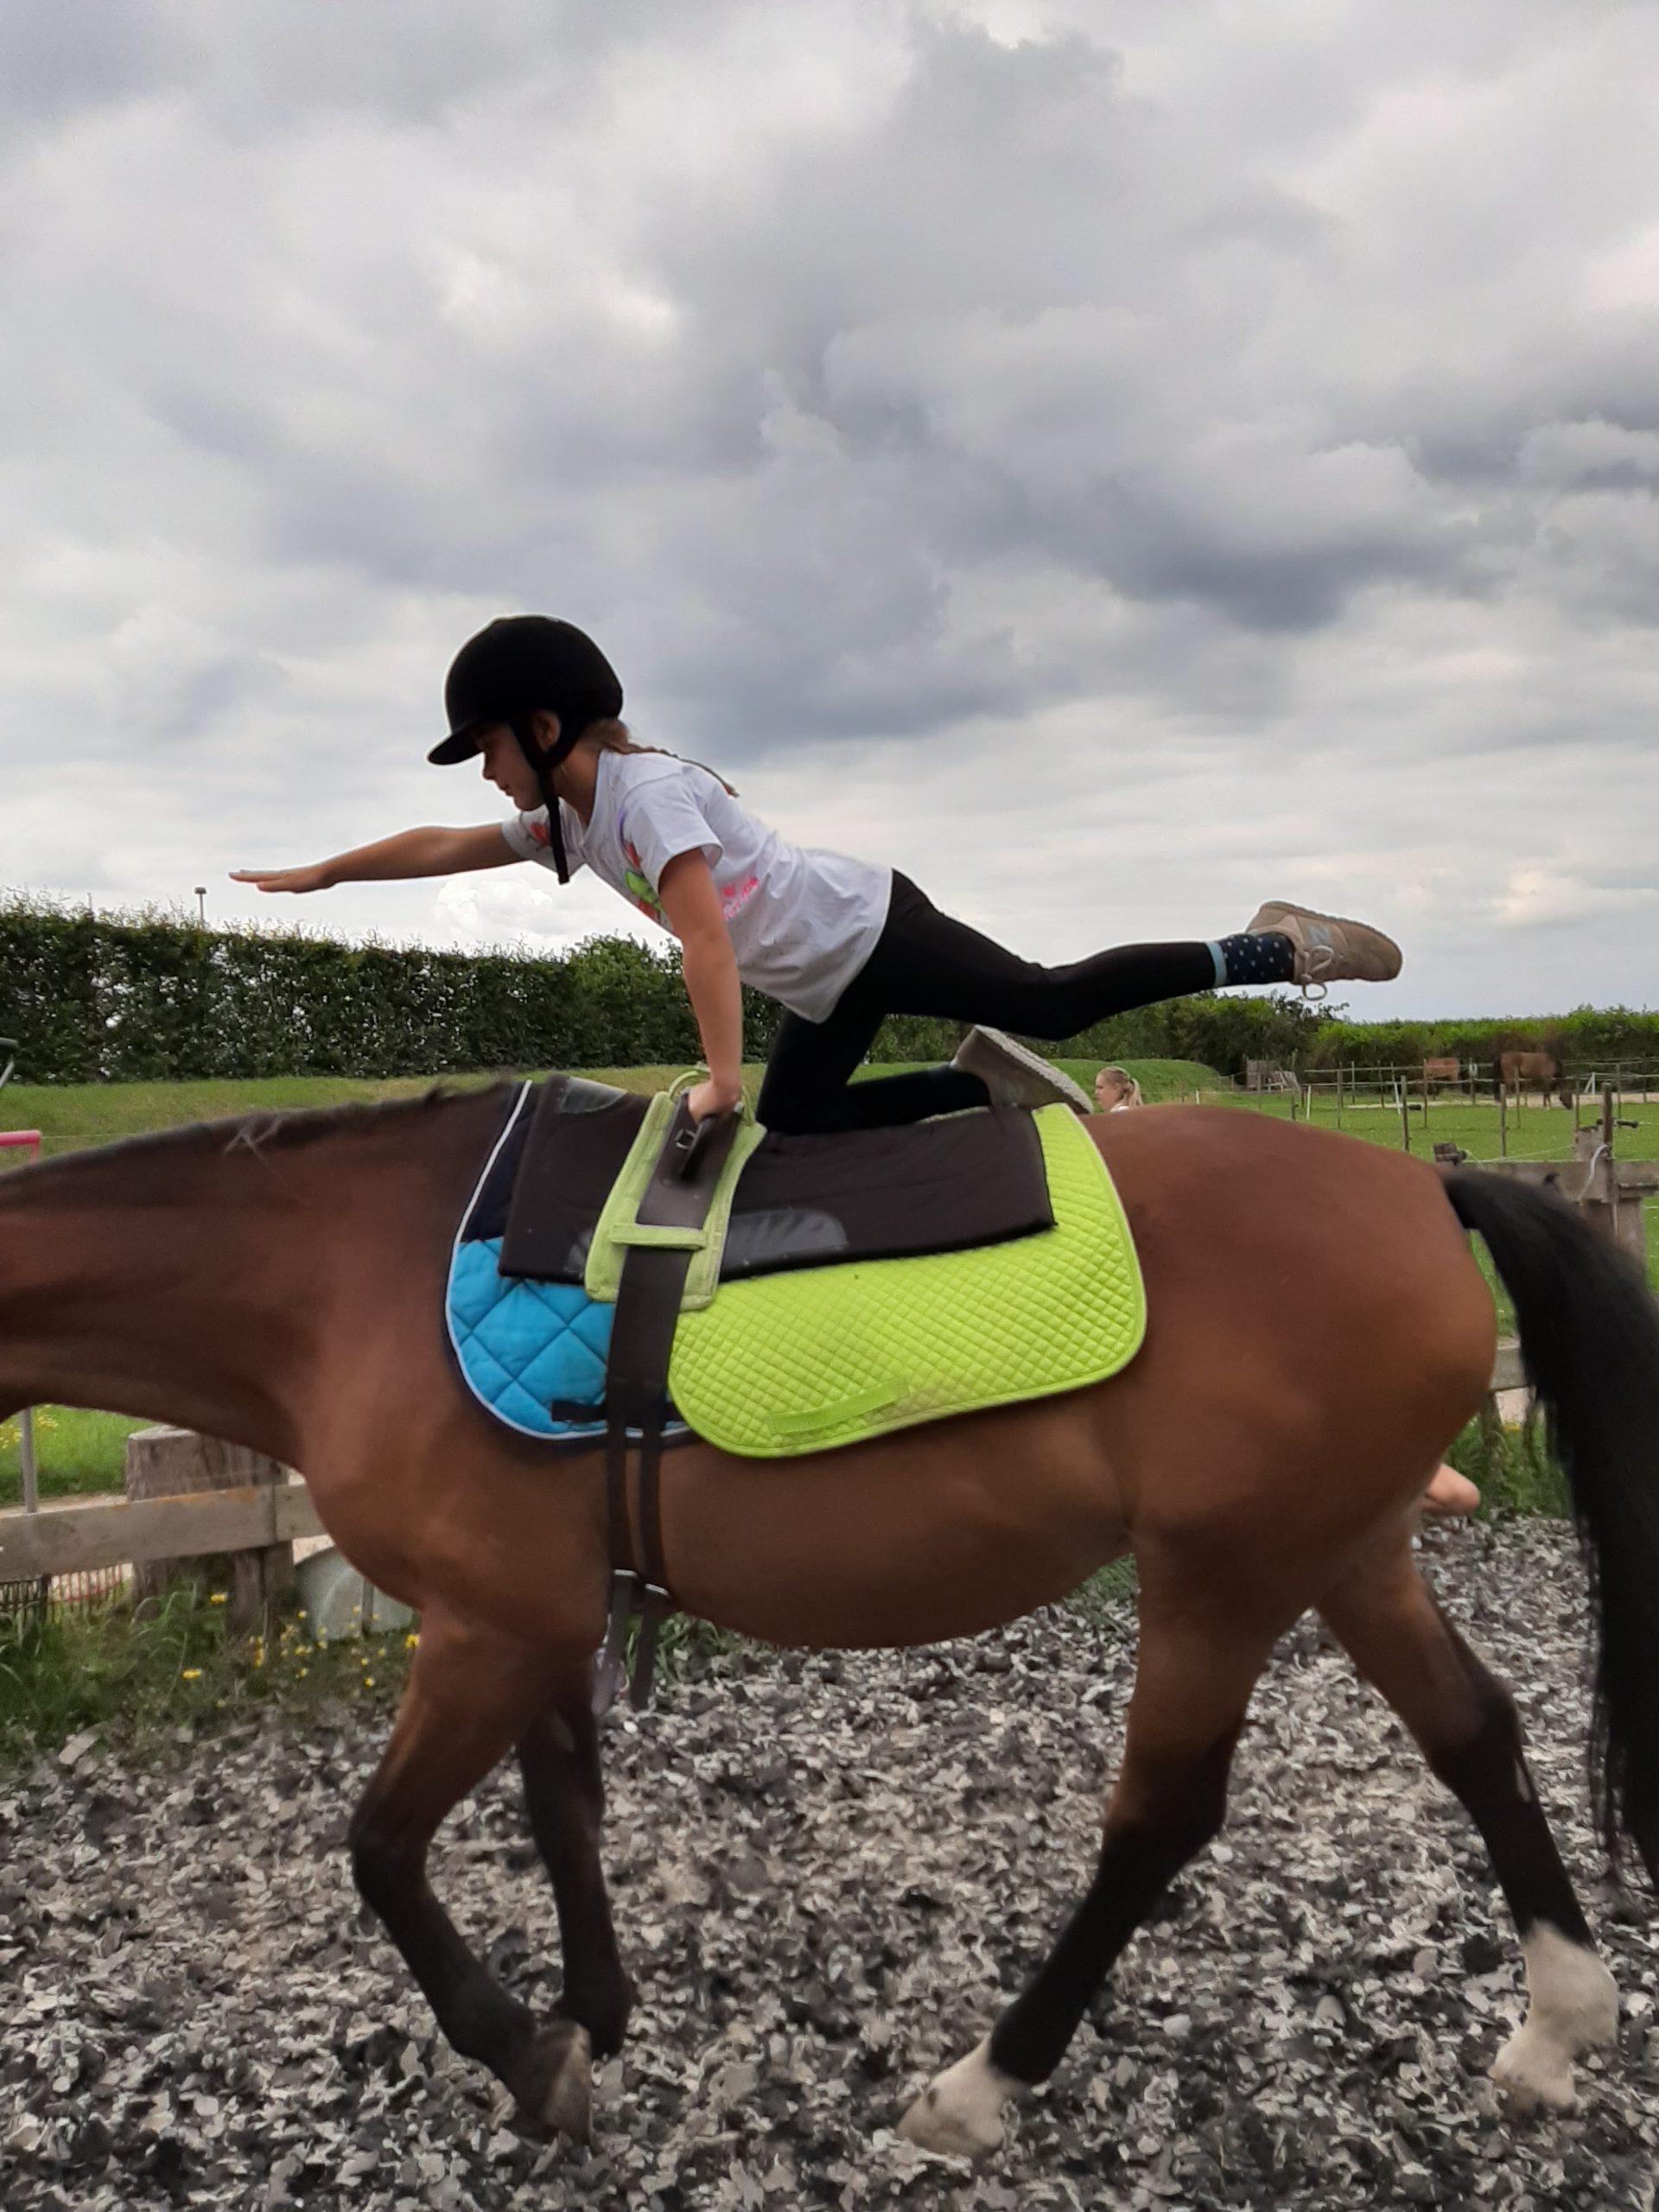 Ponykamp-Ponydagkamp-activiteiten-stal-schouten-wemeldinge